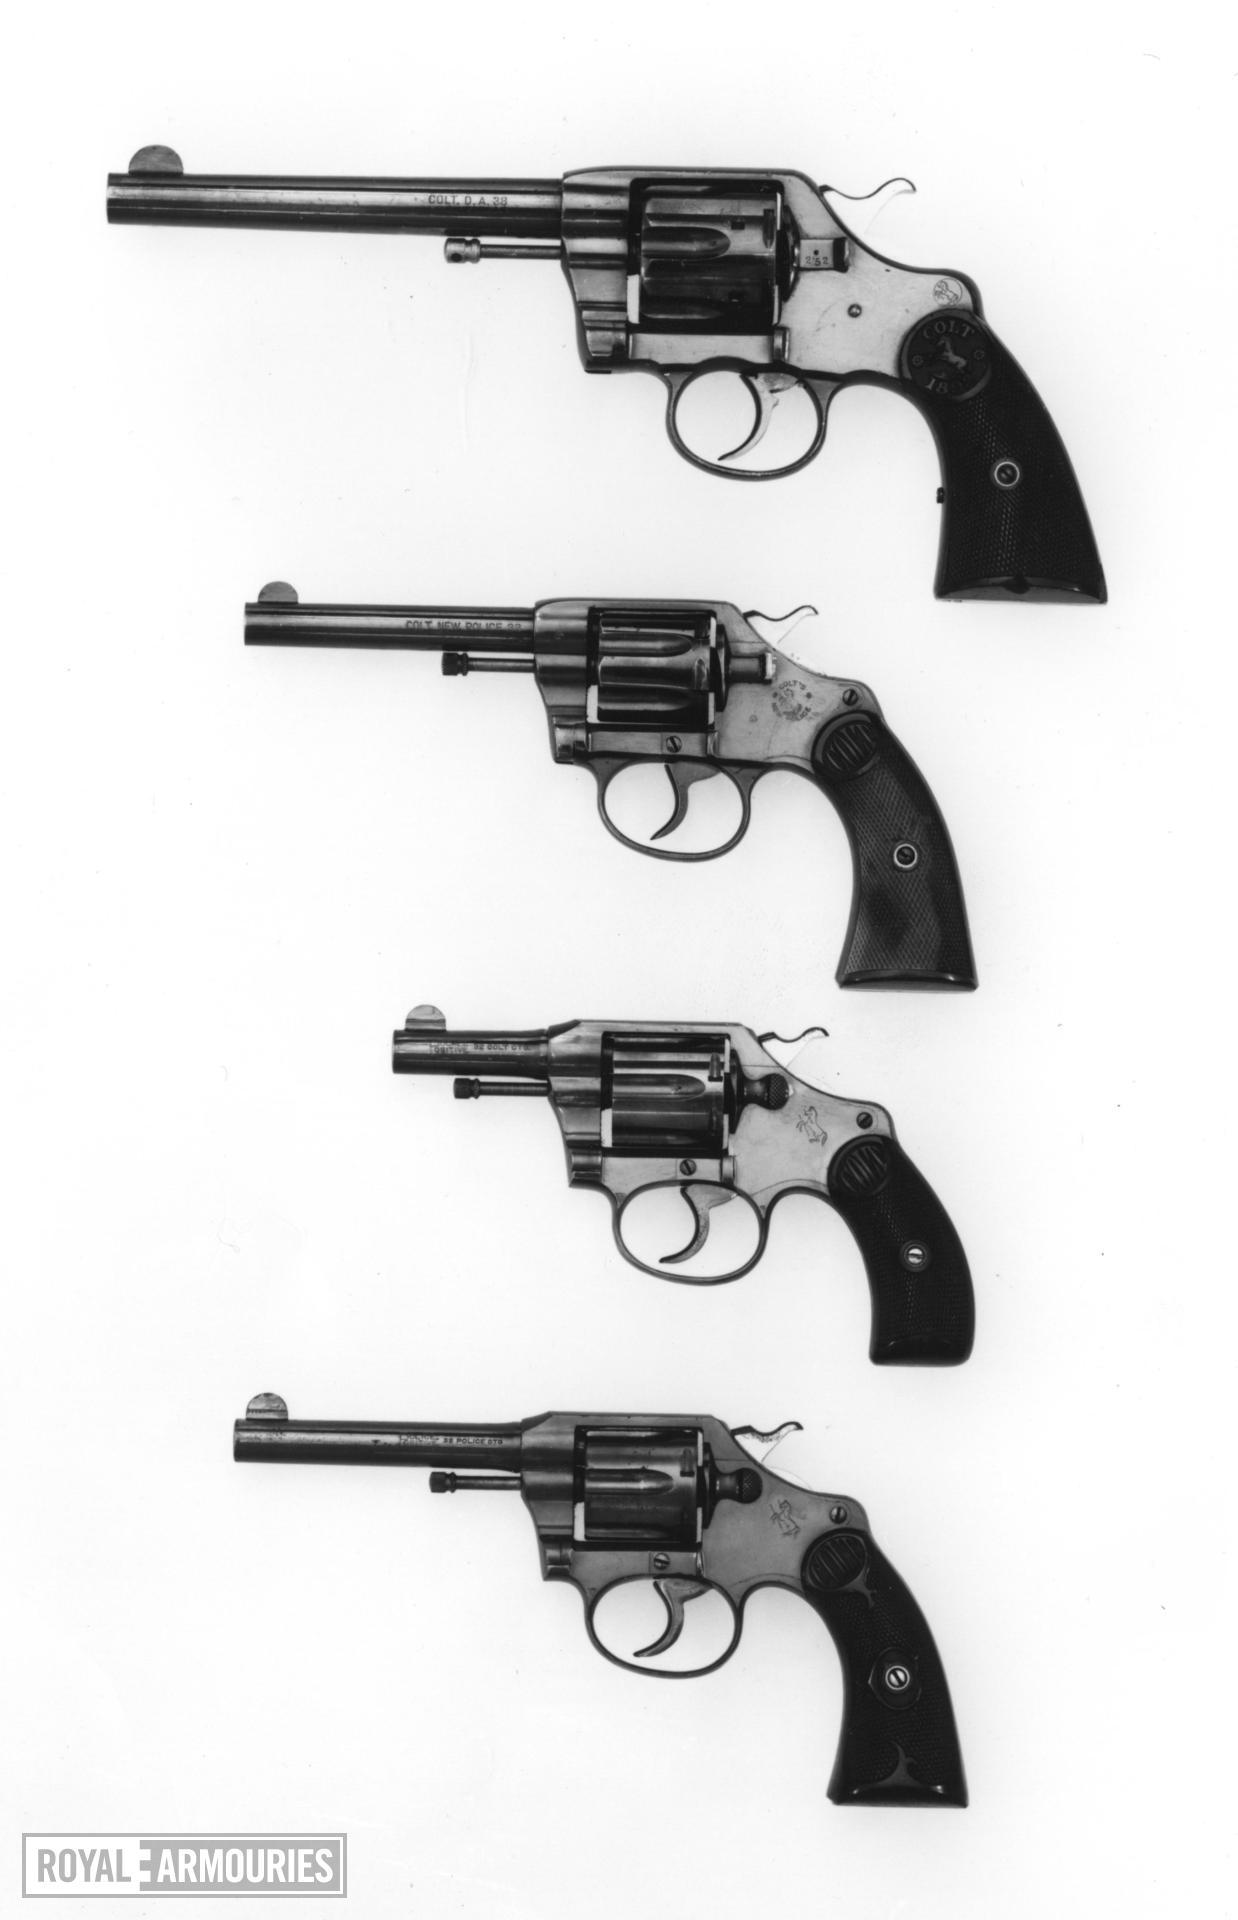 Centrefire six-shot revolver - Colt New Police 32 Model